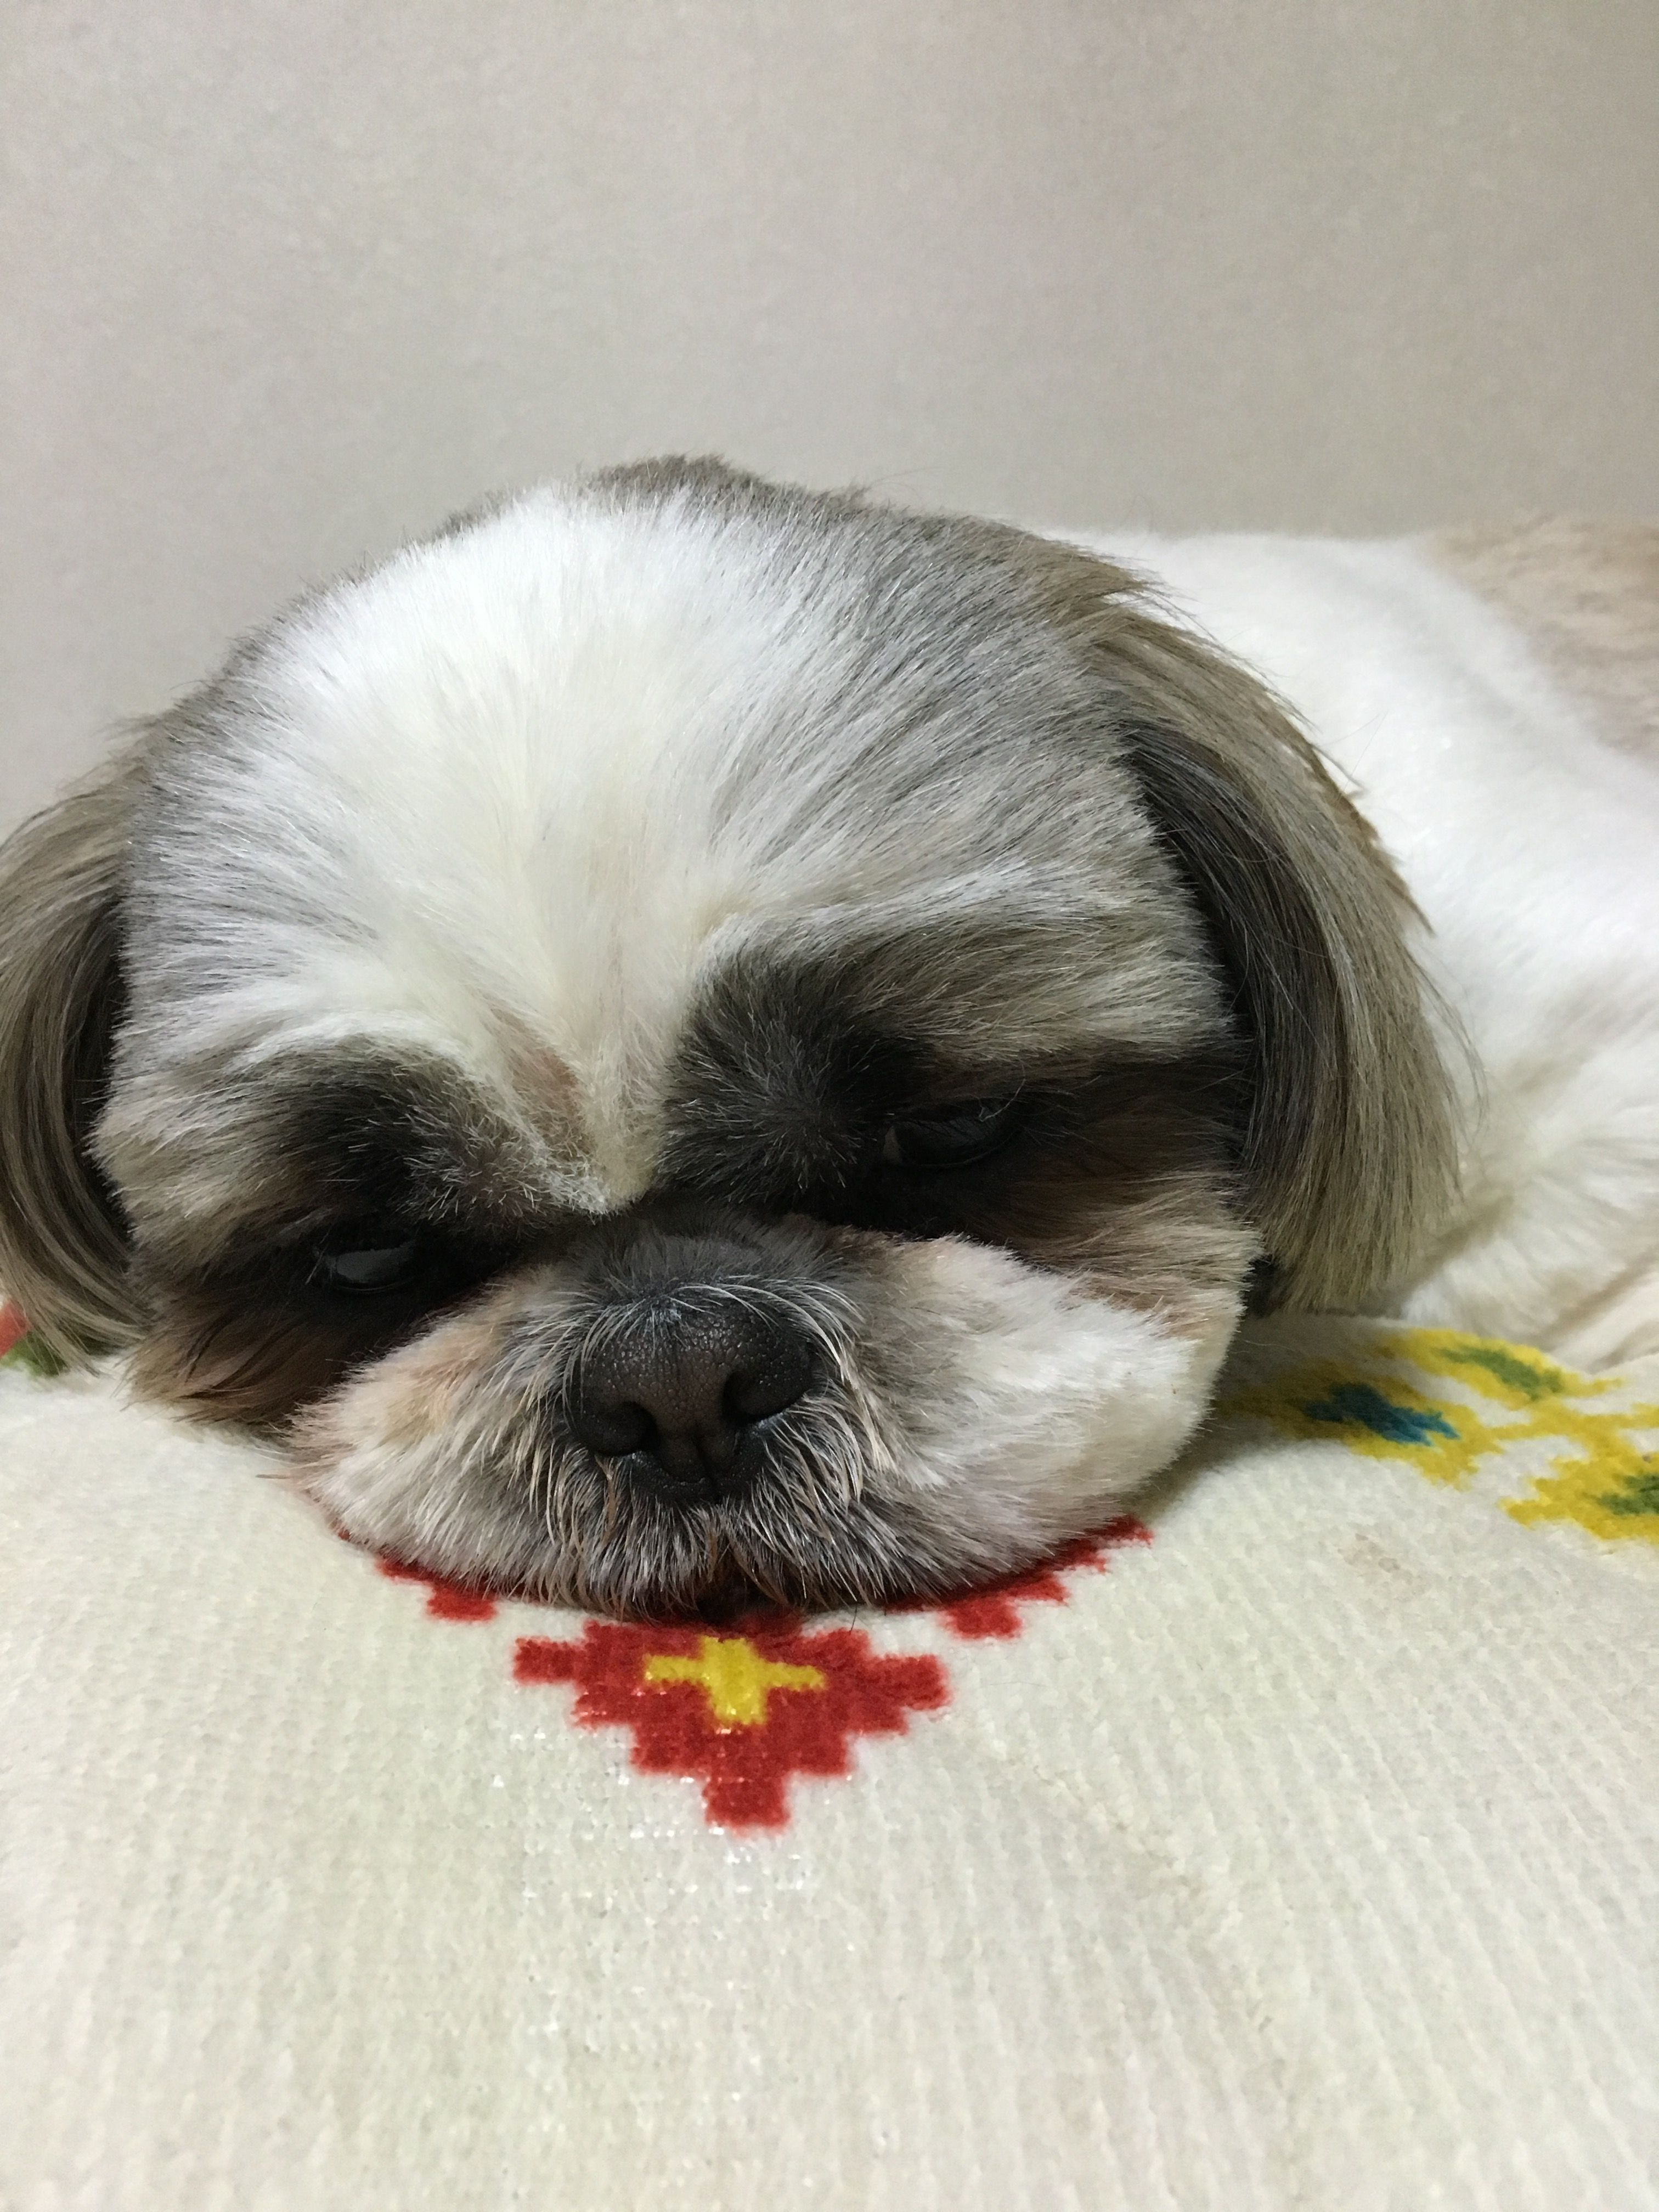 Pin By Joan Moran On Shih Tzu Shih Tzu Shih Tzu Puppy Shih Tzu Dog